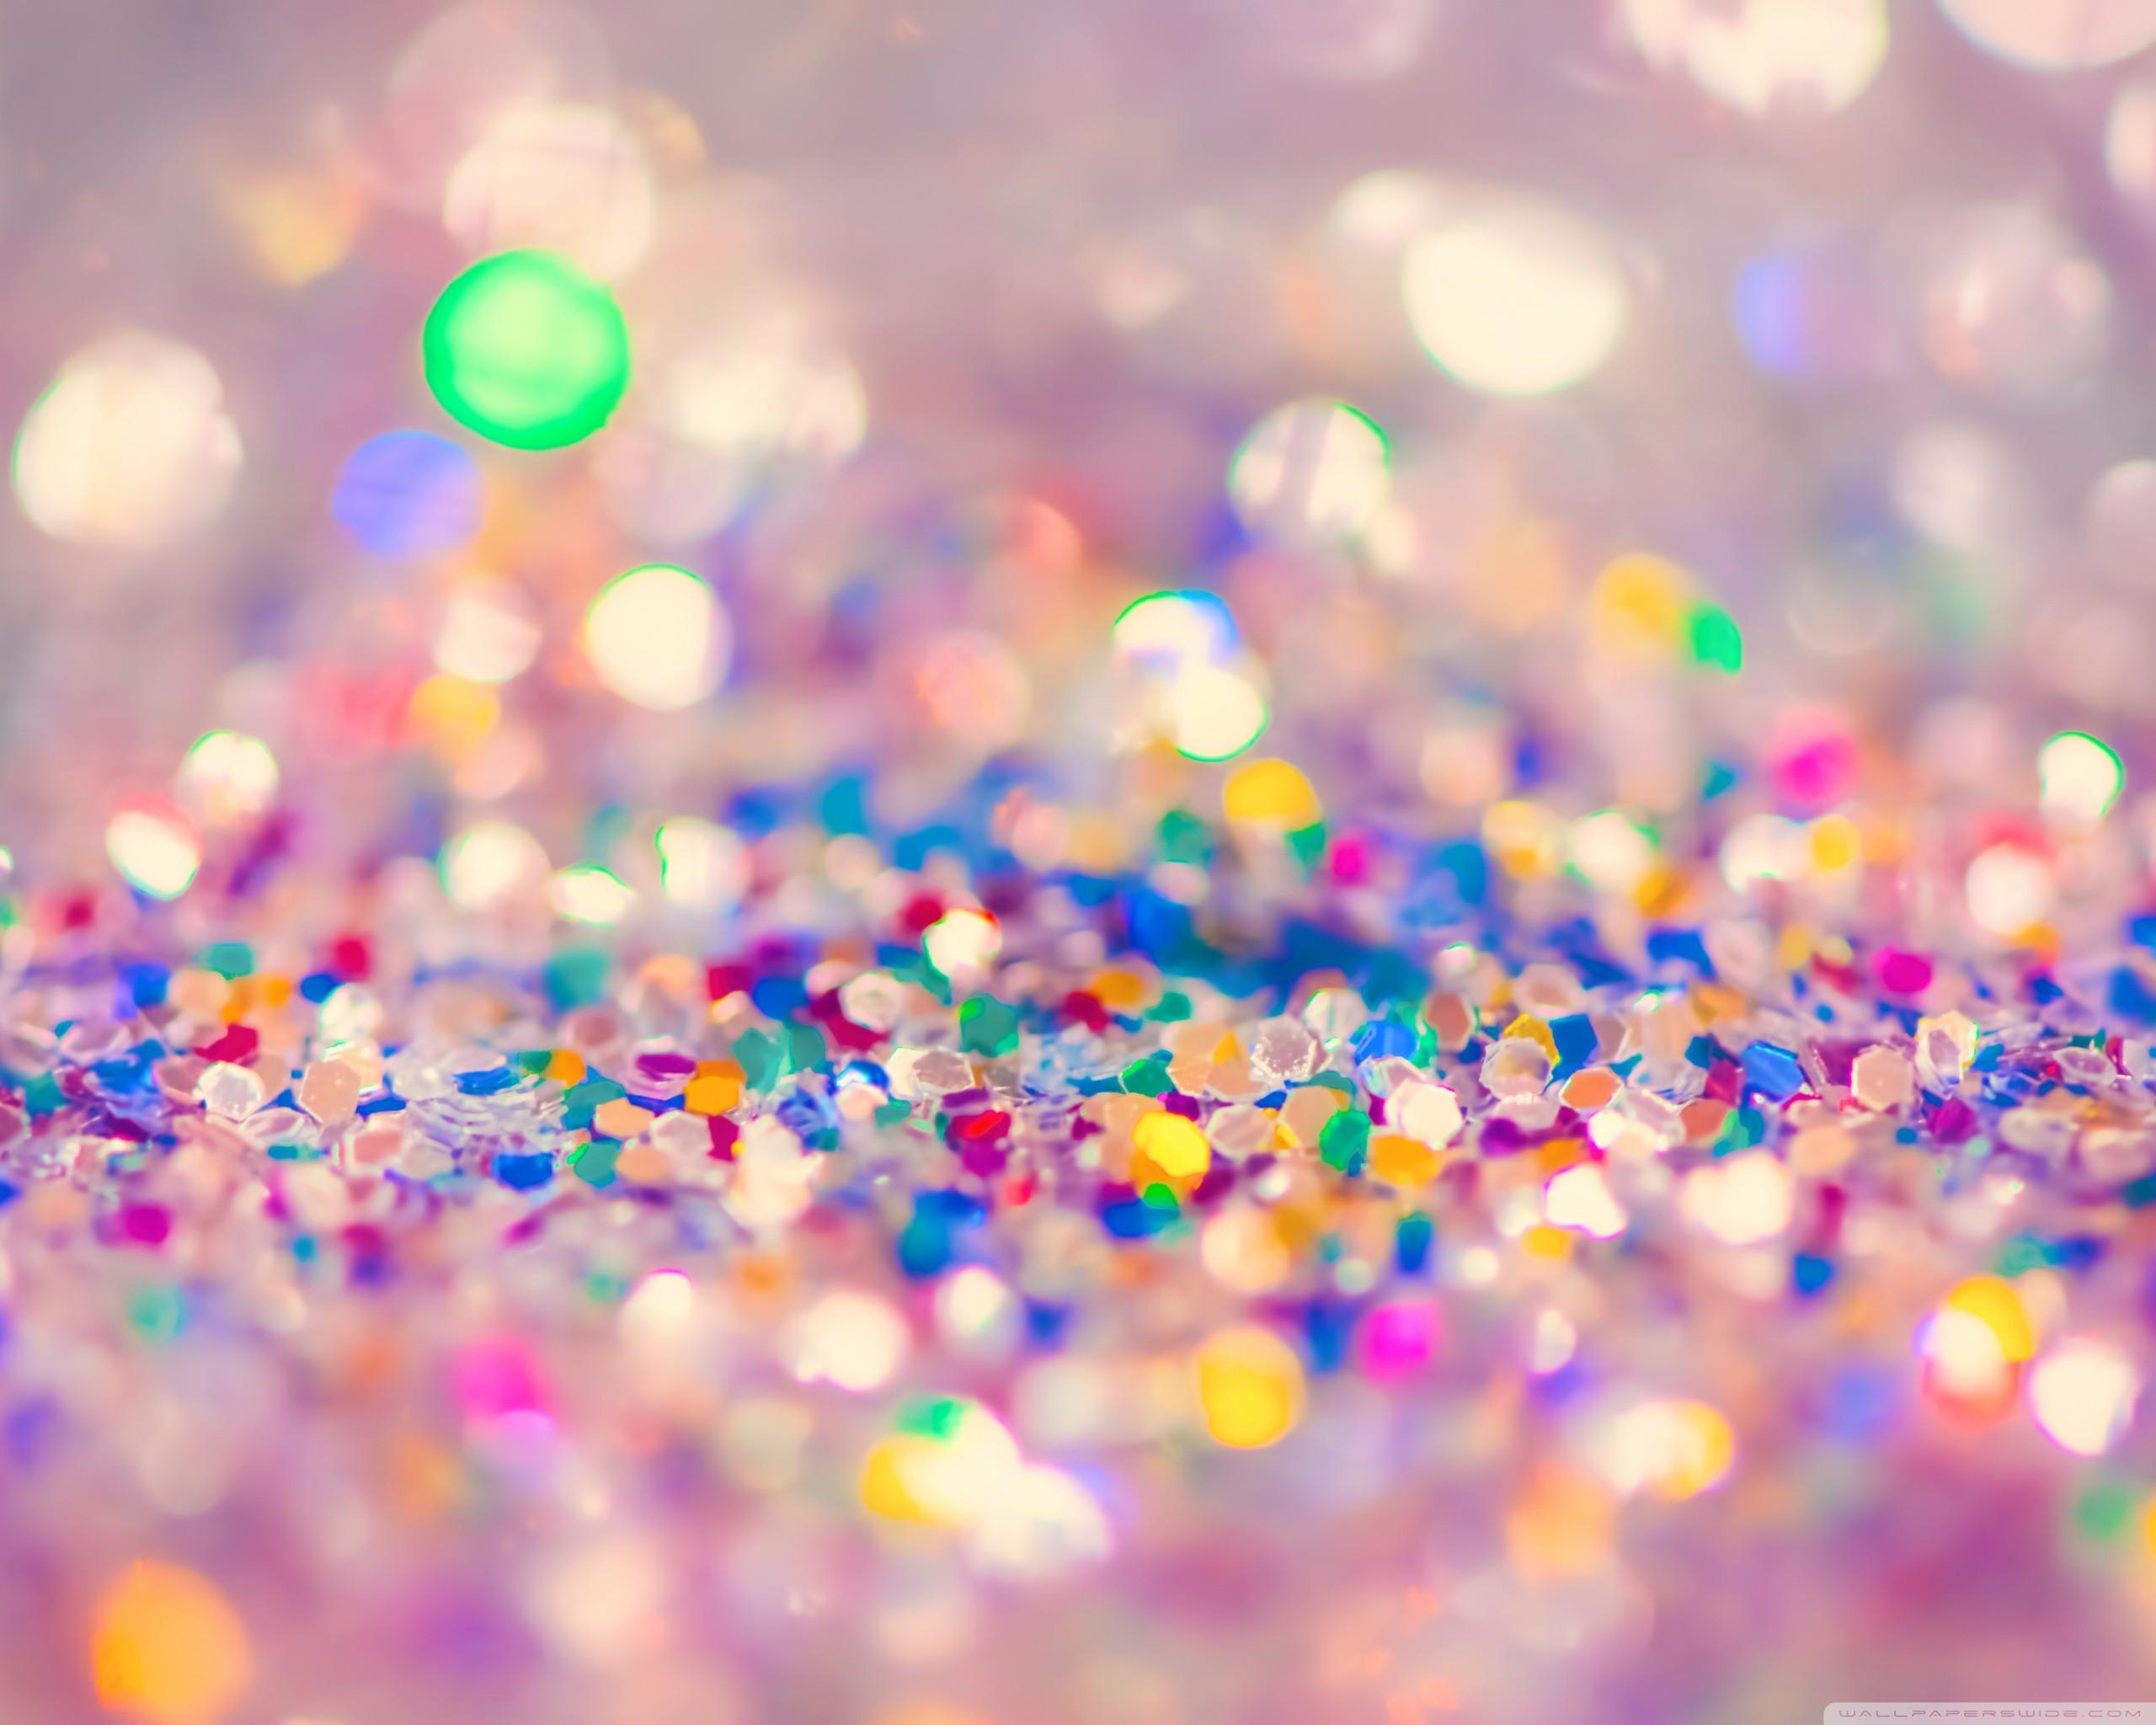 Res: 2560x2048, Colorful Glitter HD desktop wallpaper : High Definition .